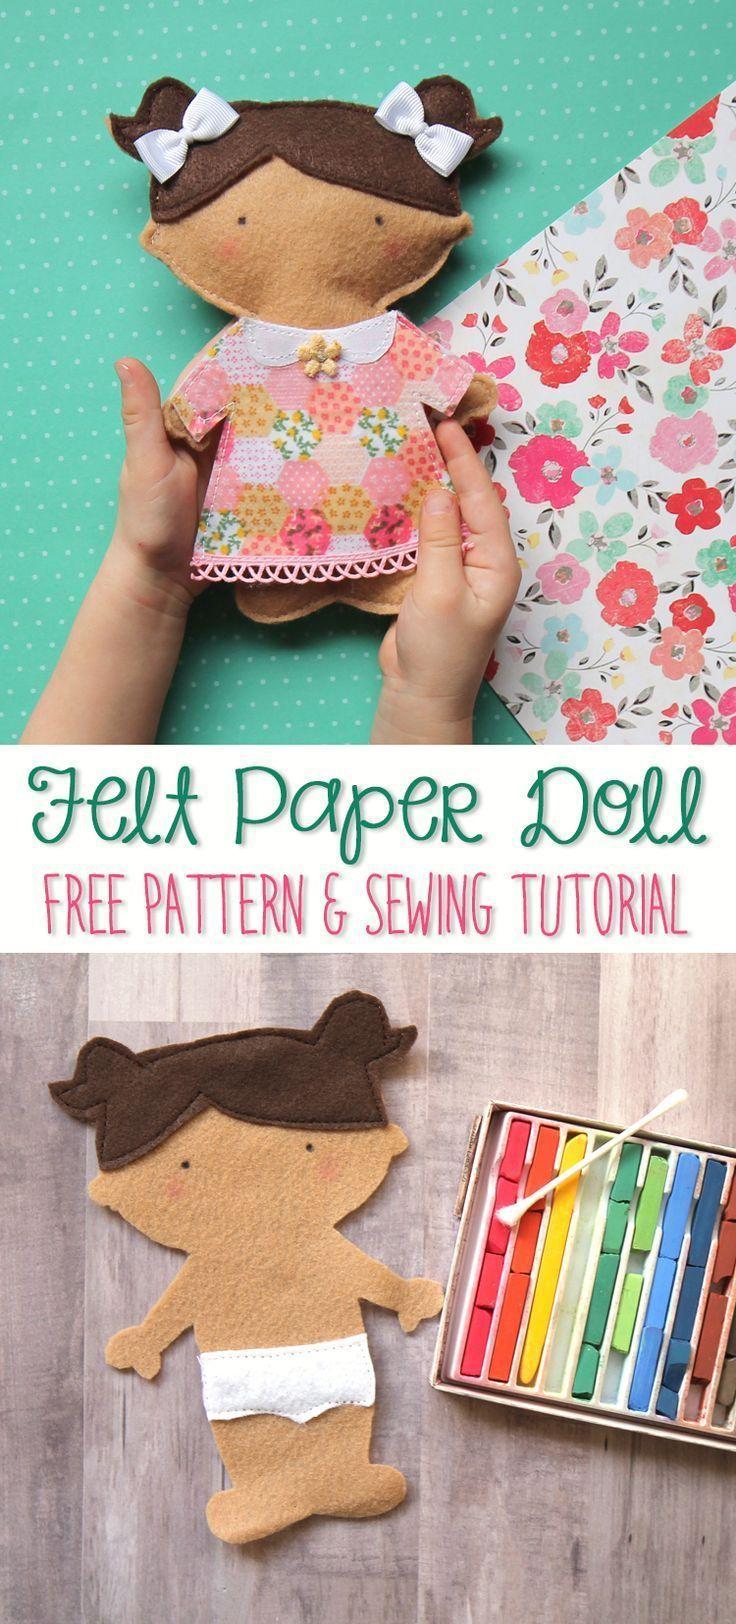 Felt Paper Doll Tutorial Free Pattern